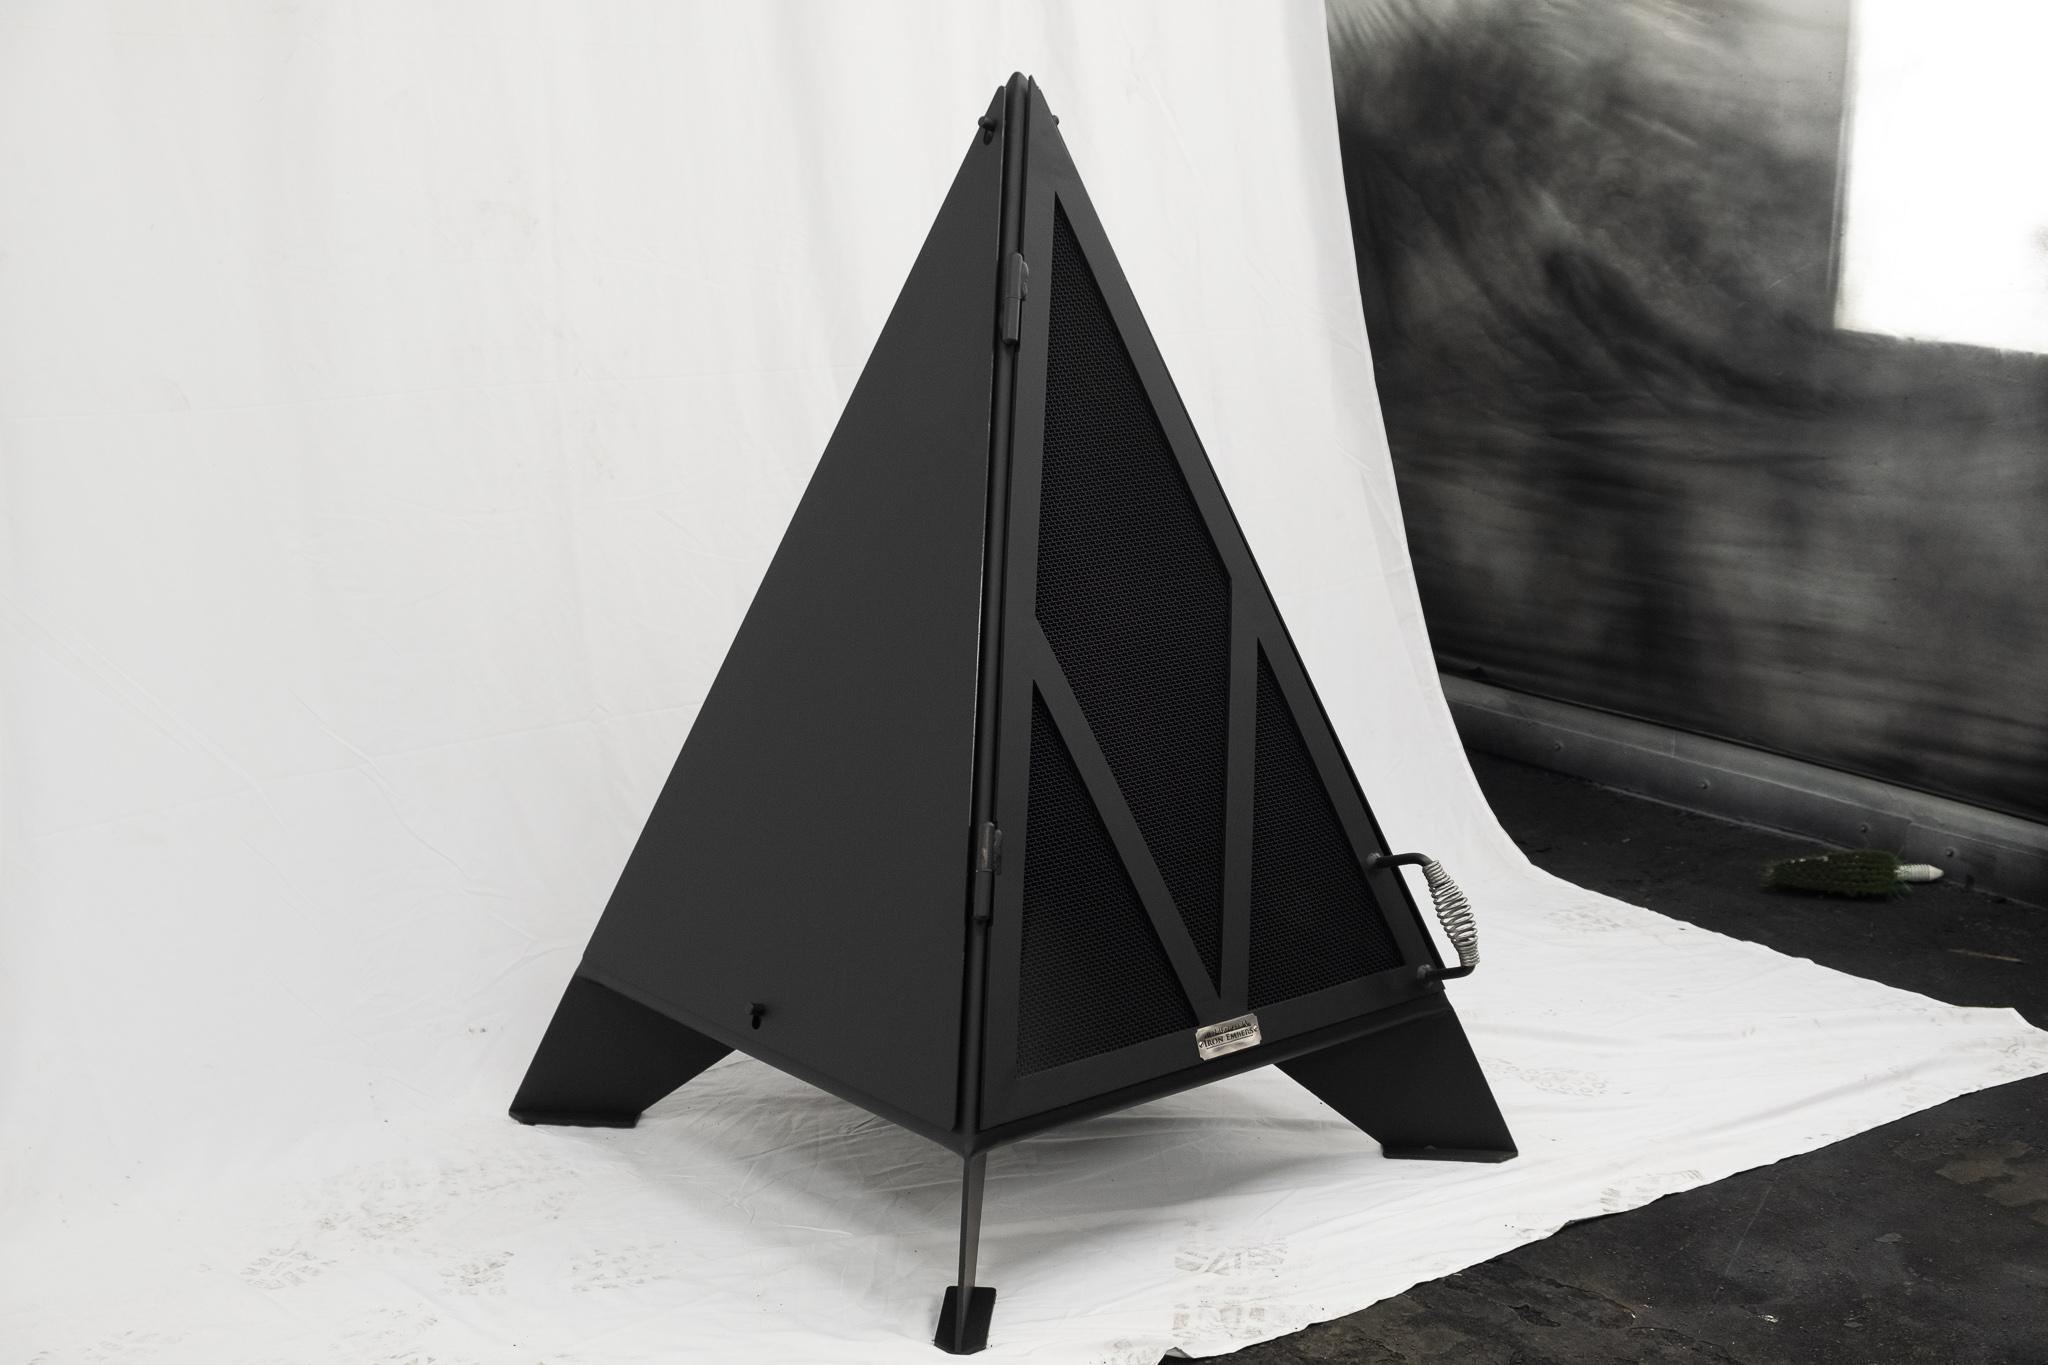 Pyramid Wind panels